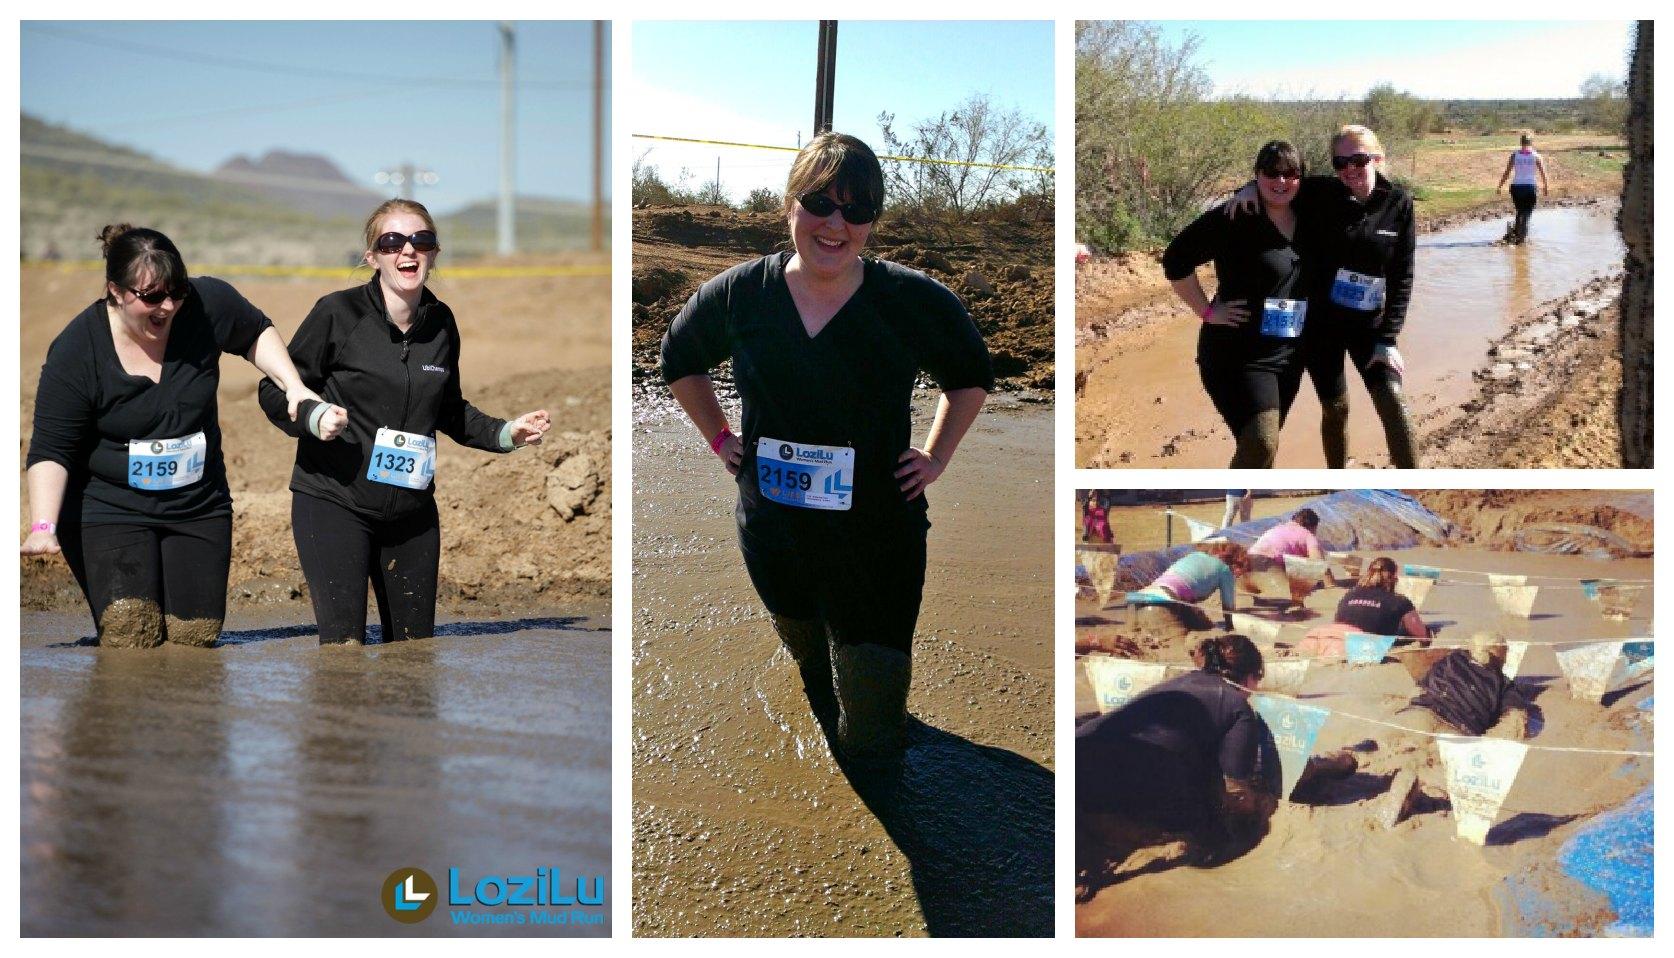 Lozilu Mud Obstacles